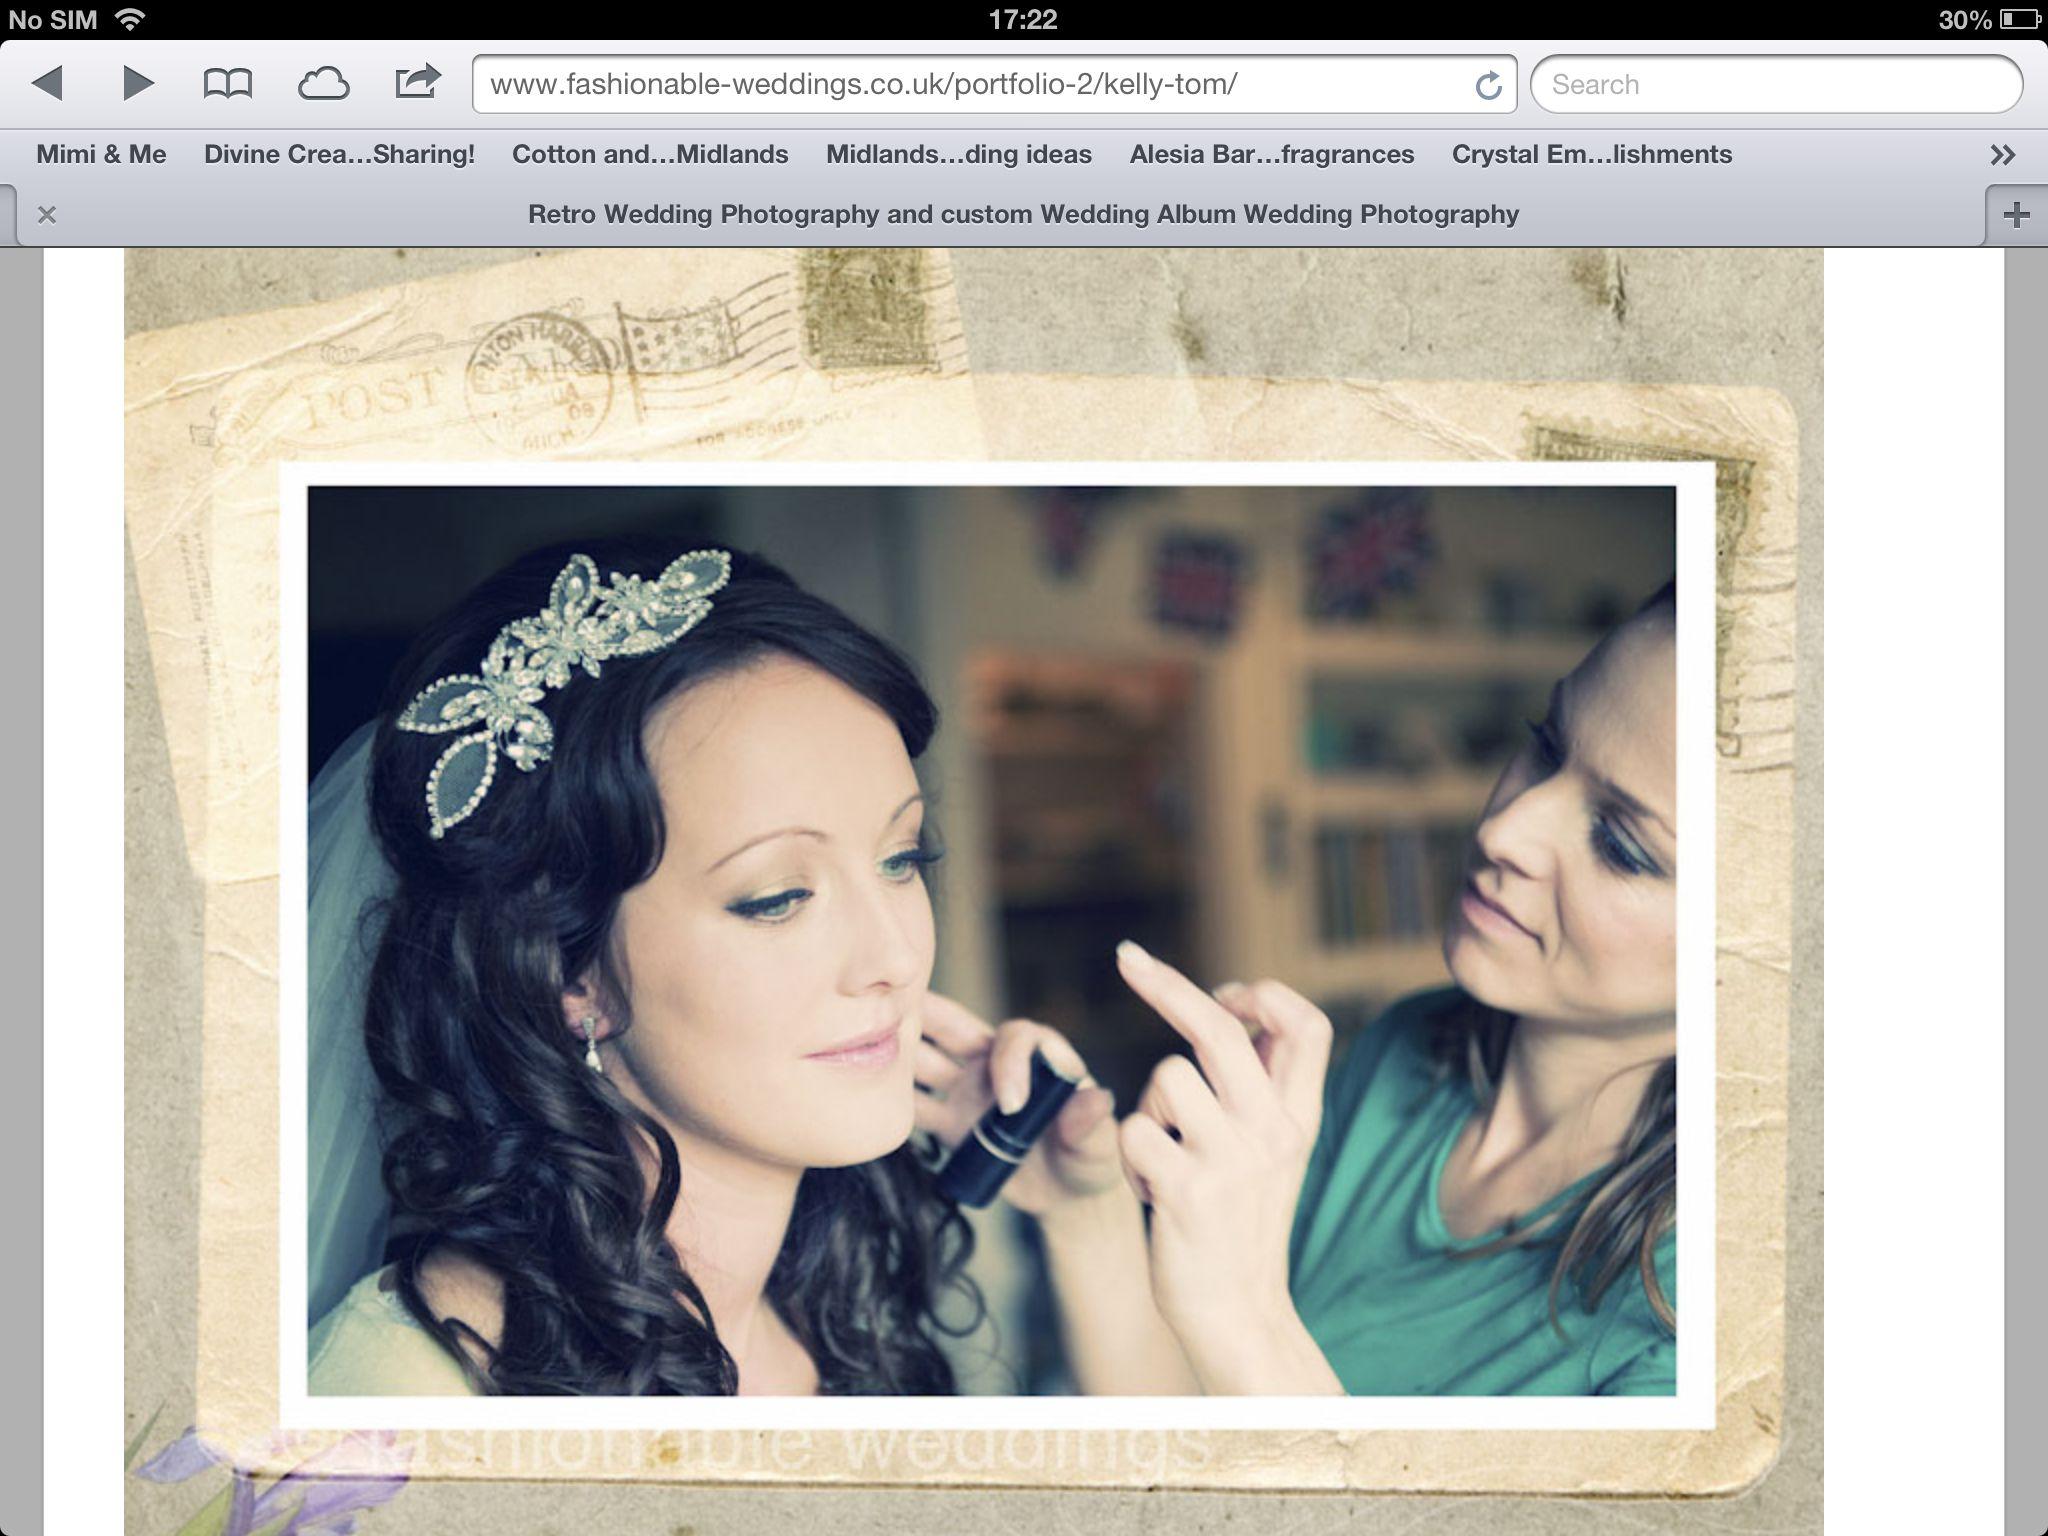 James Nader at Fashionable Weddings Wedding photography